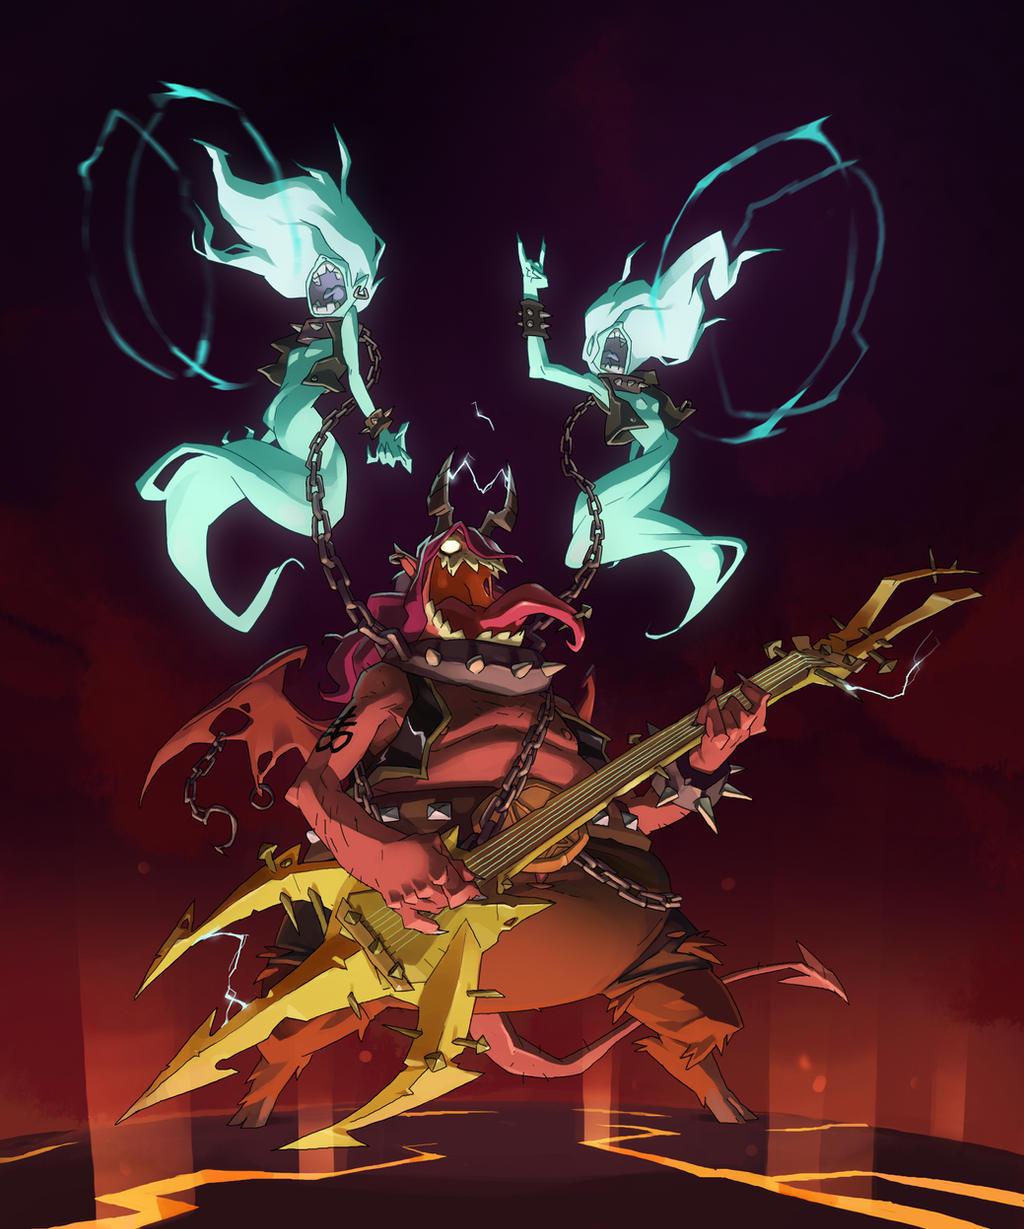 Character Design Challenge April : Metal demon by saindoo on deviantart